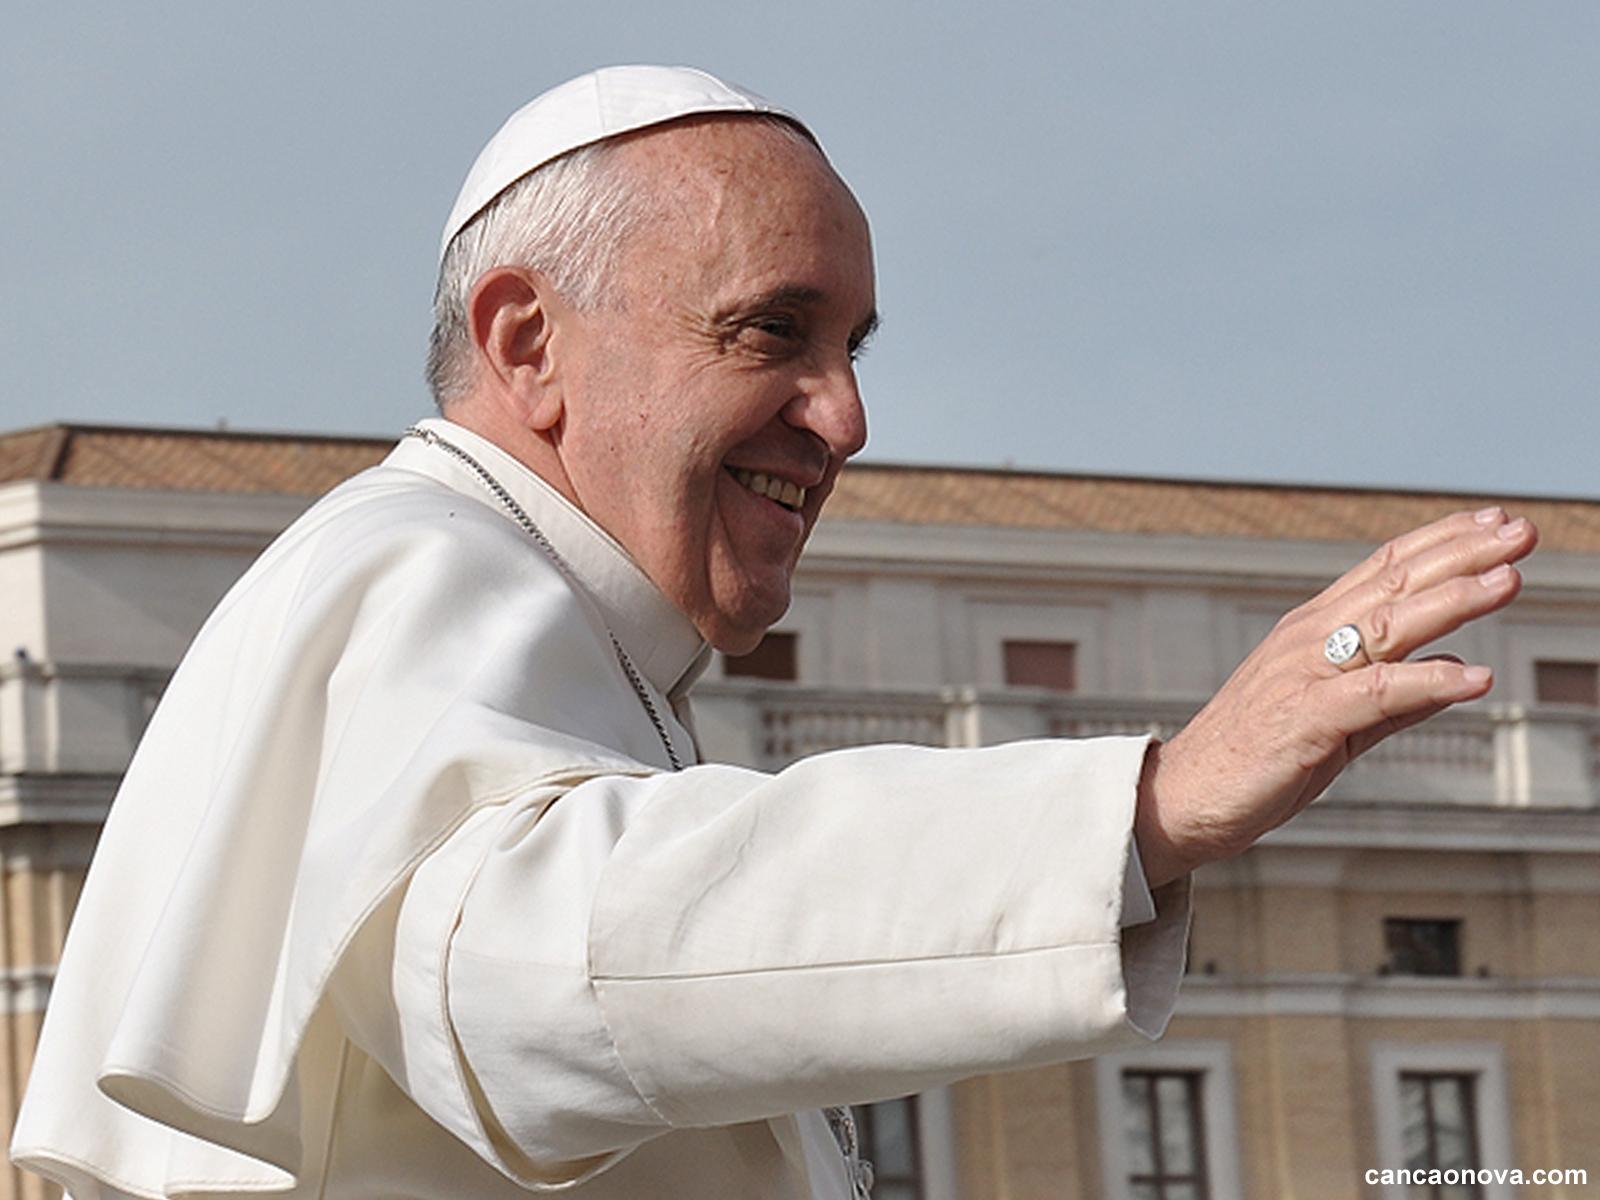 Confira treze conselhos do Papa Francisco para ser santo - 1600x1200